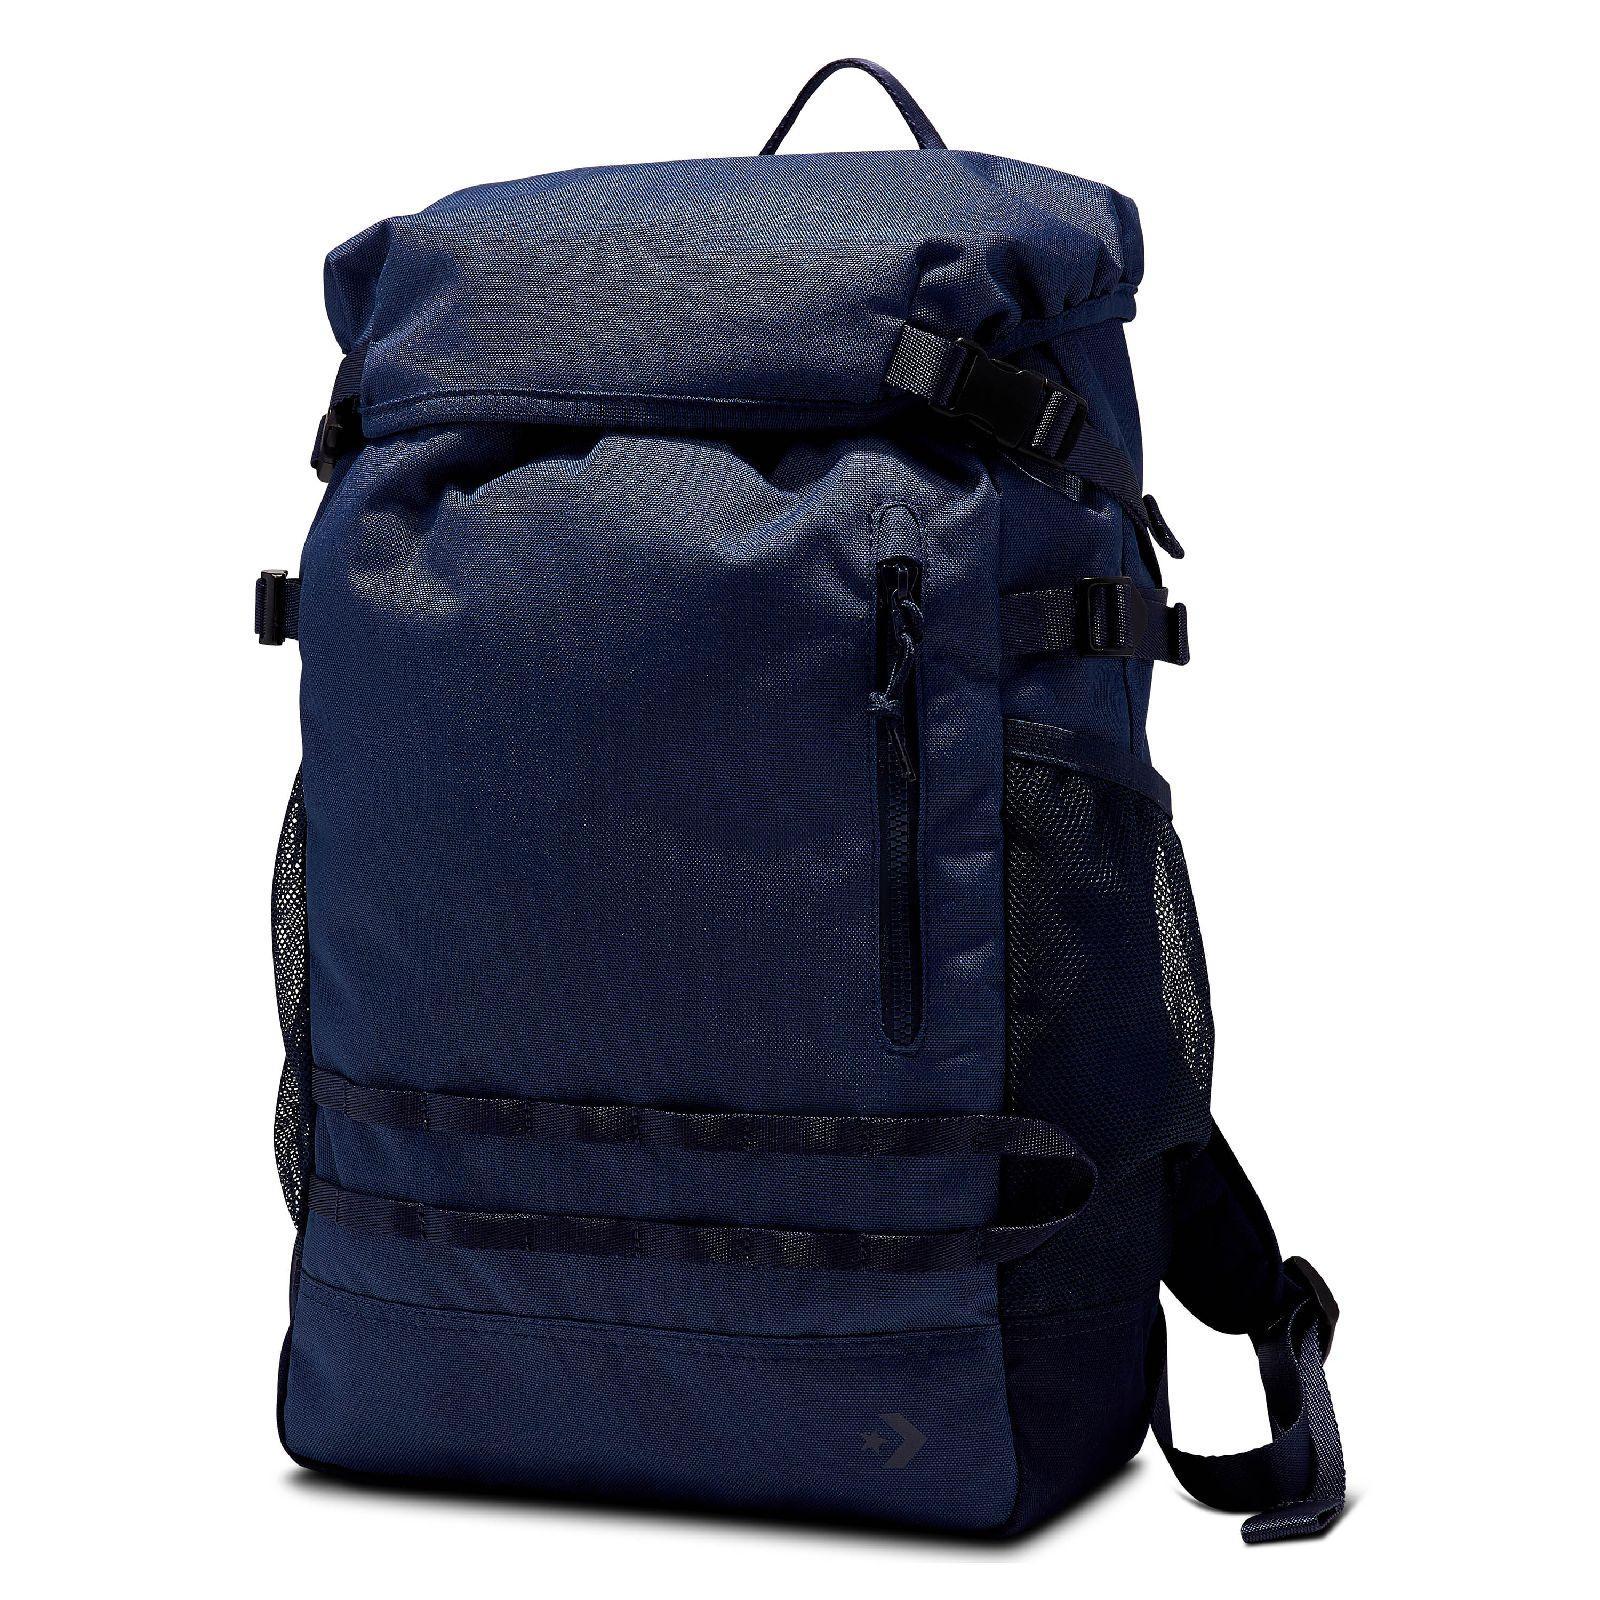 ddebcebae49 Latest Converse,NORTHSTAR Backpacks Products | Enjoy Huge Discounts ...